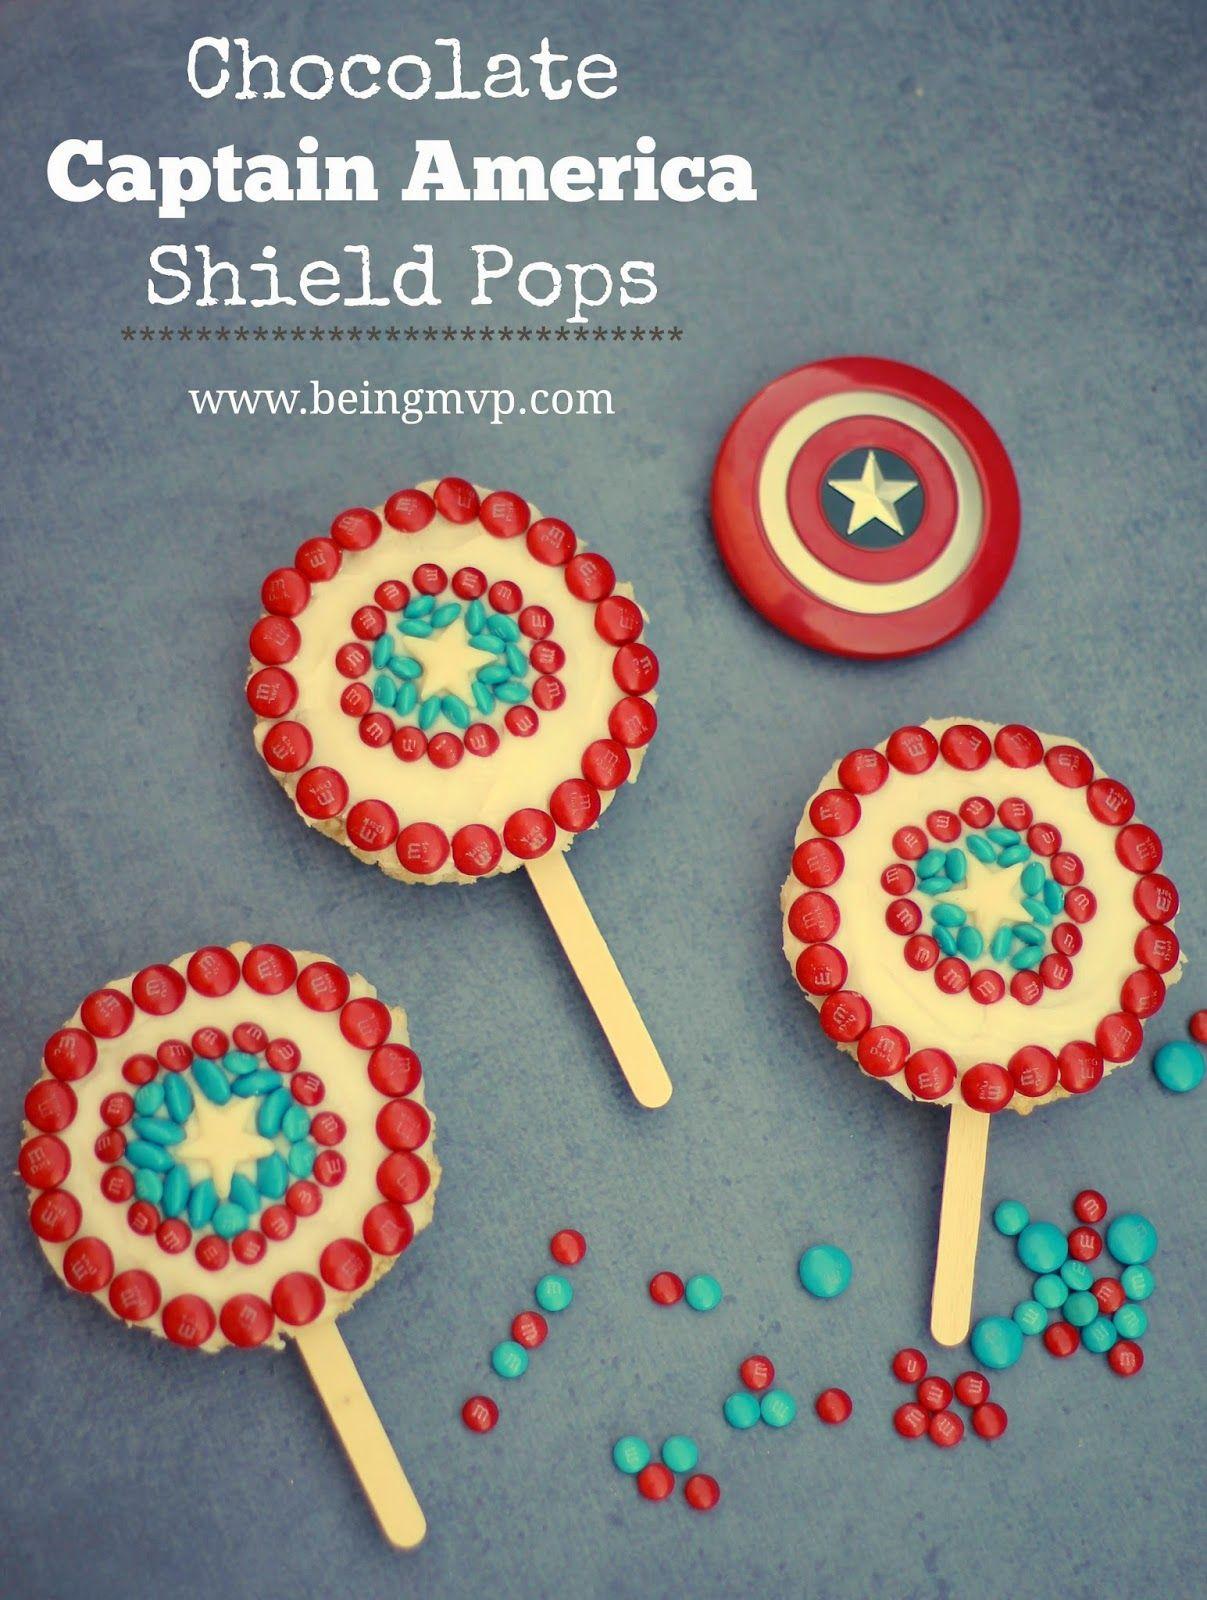 Chocolate Captain America Shield Pops {Recipe} + #coupon #HeroesEatMMs #CollectiveBias #shop